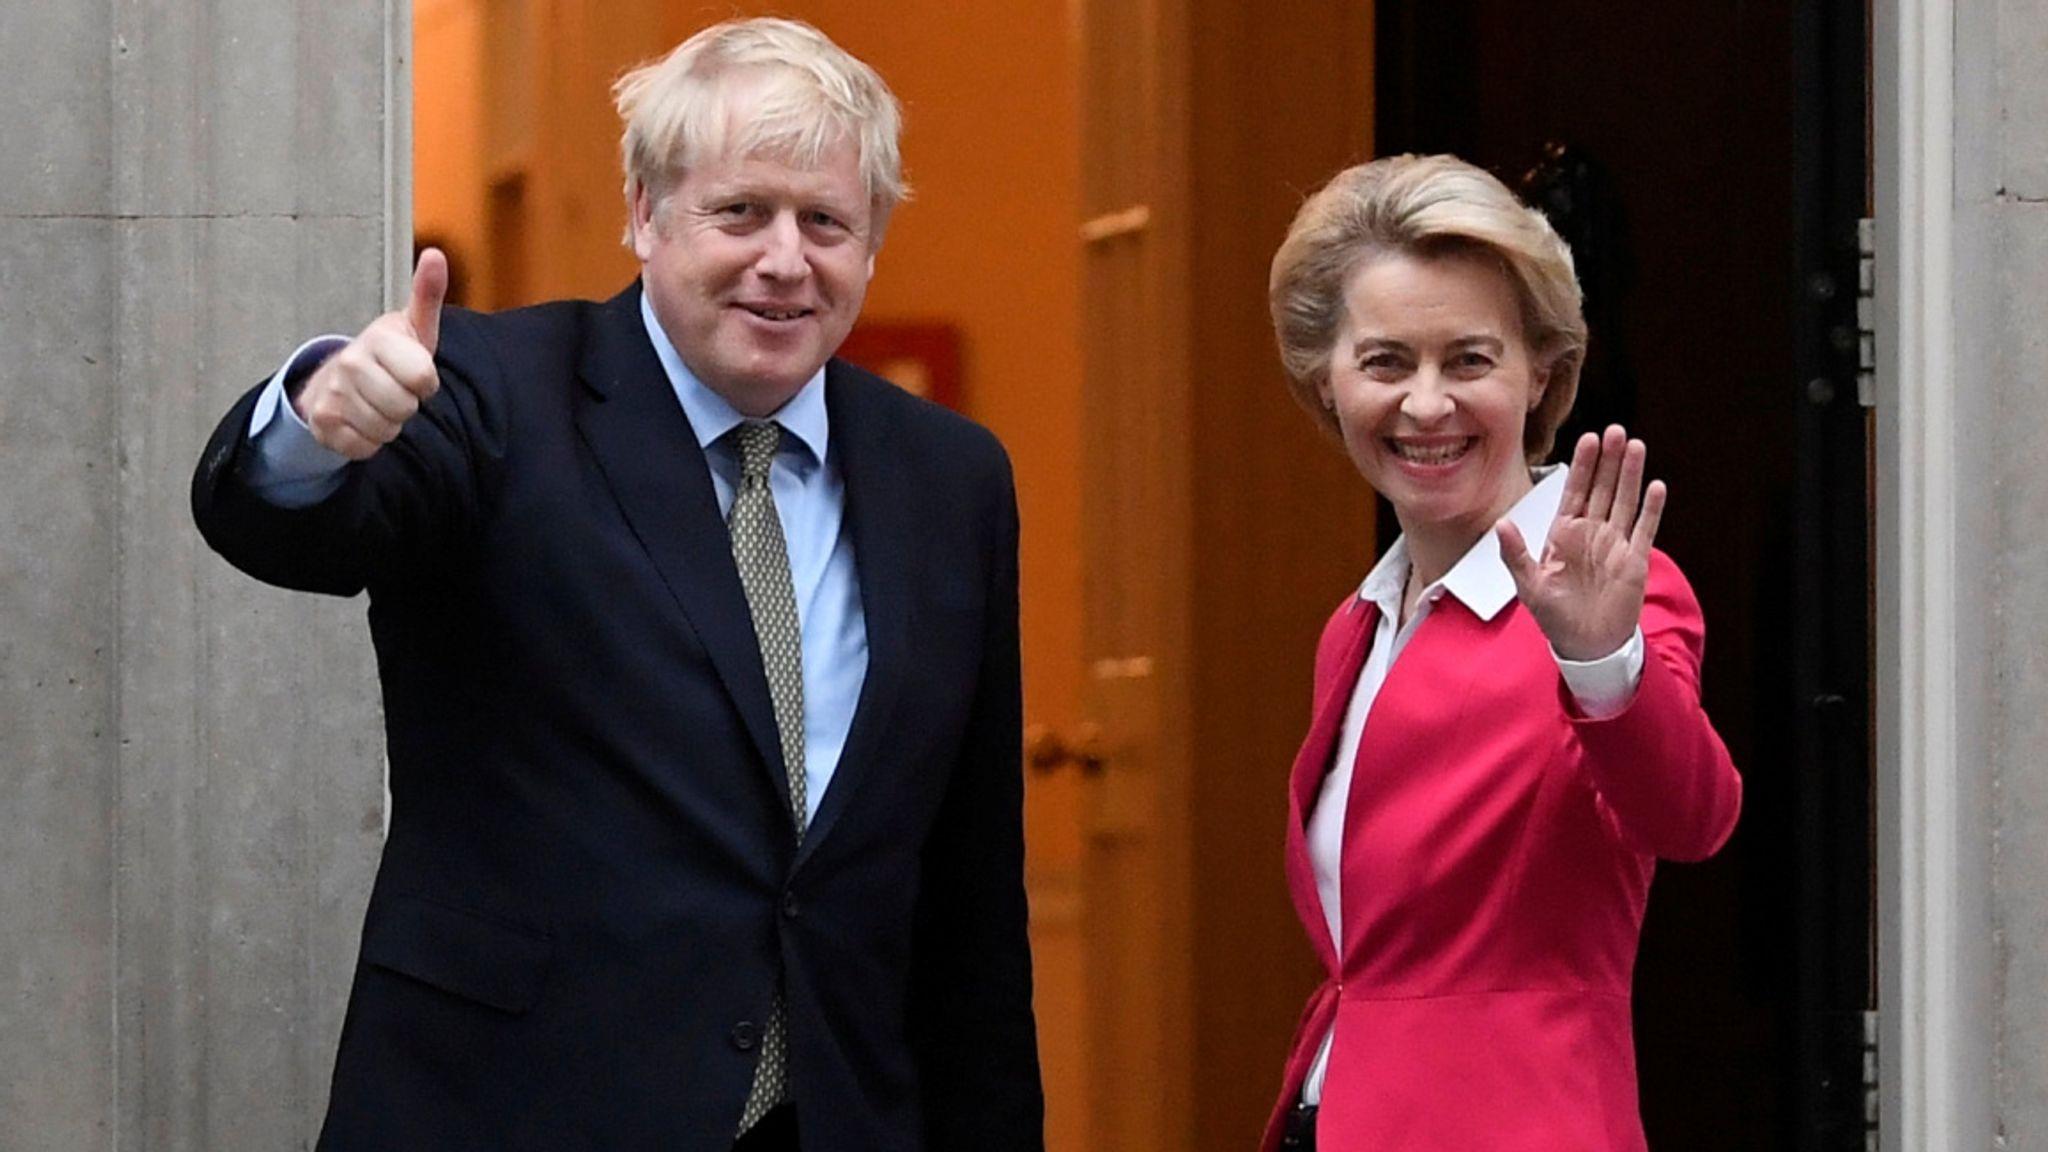 Von der Leyen and Johnson's Continuing Frenemy Status Following Brexit